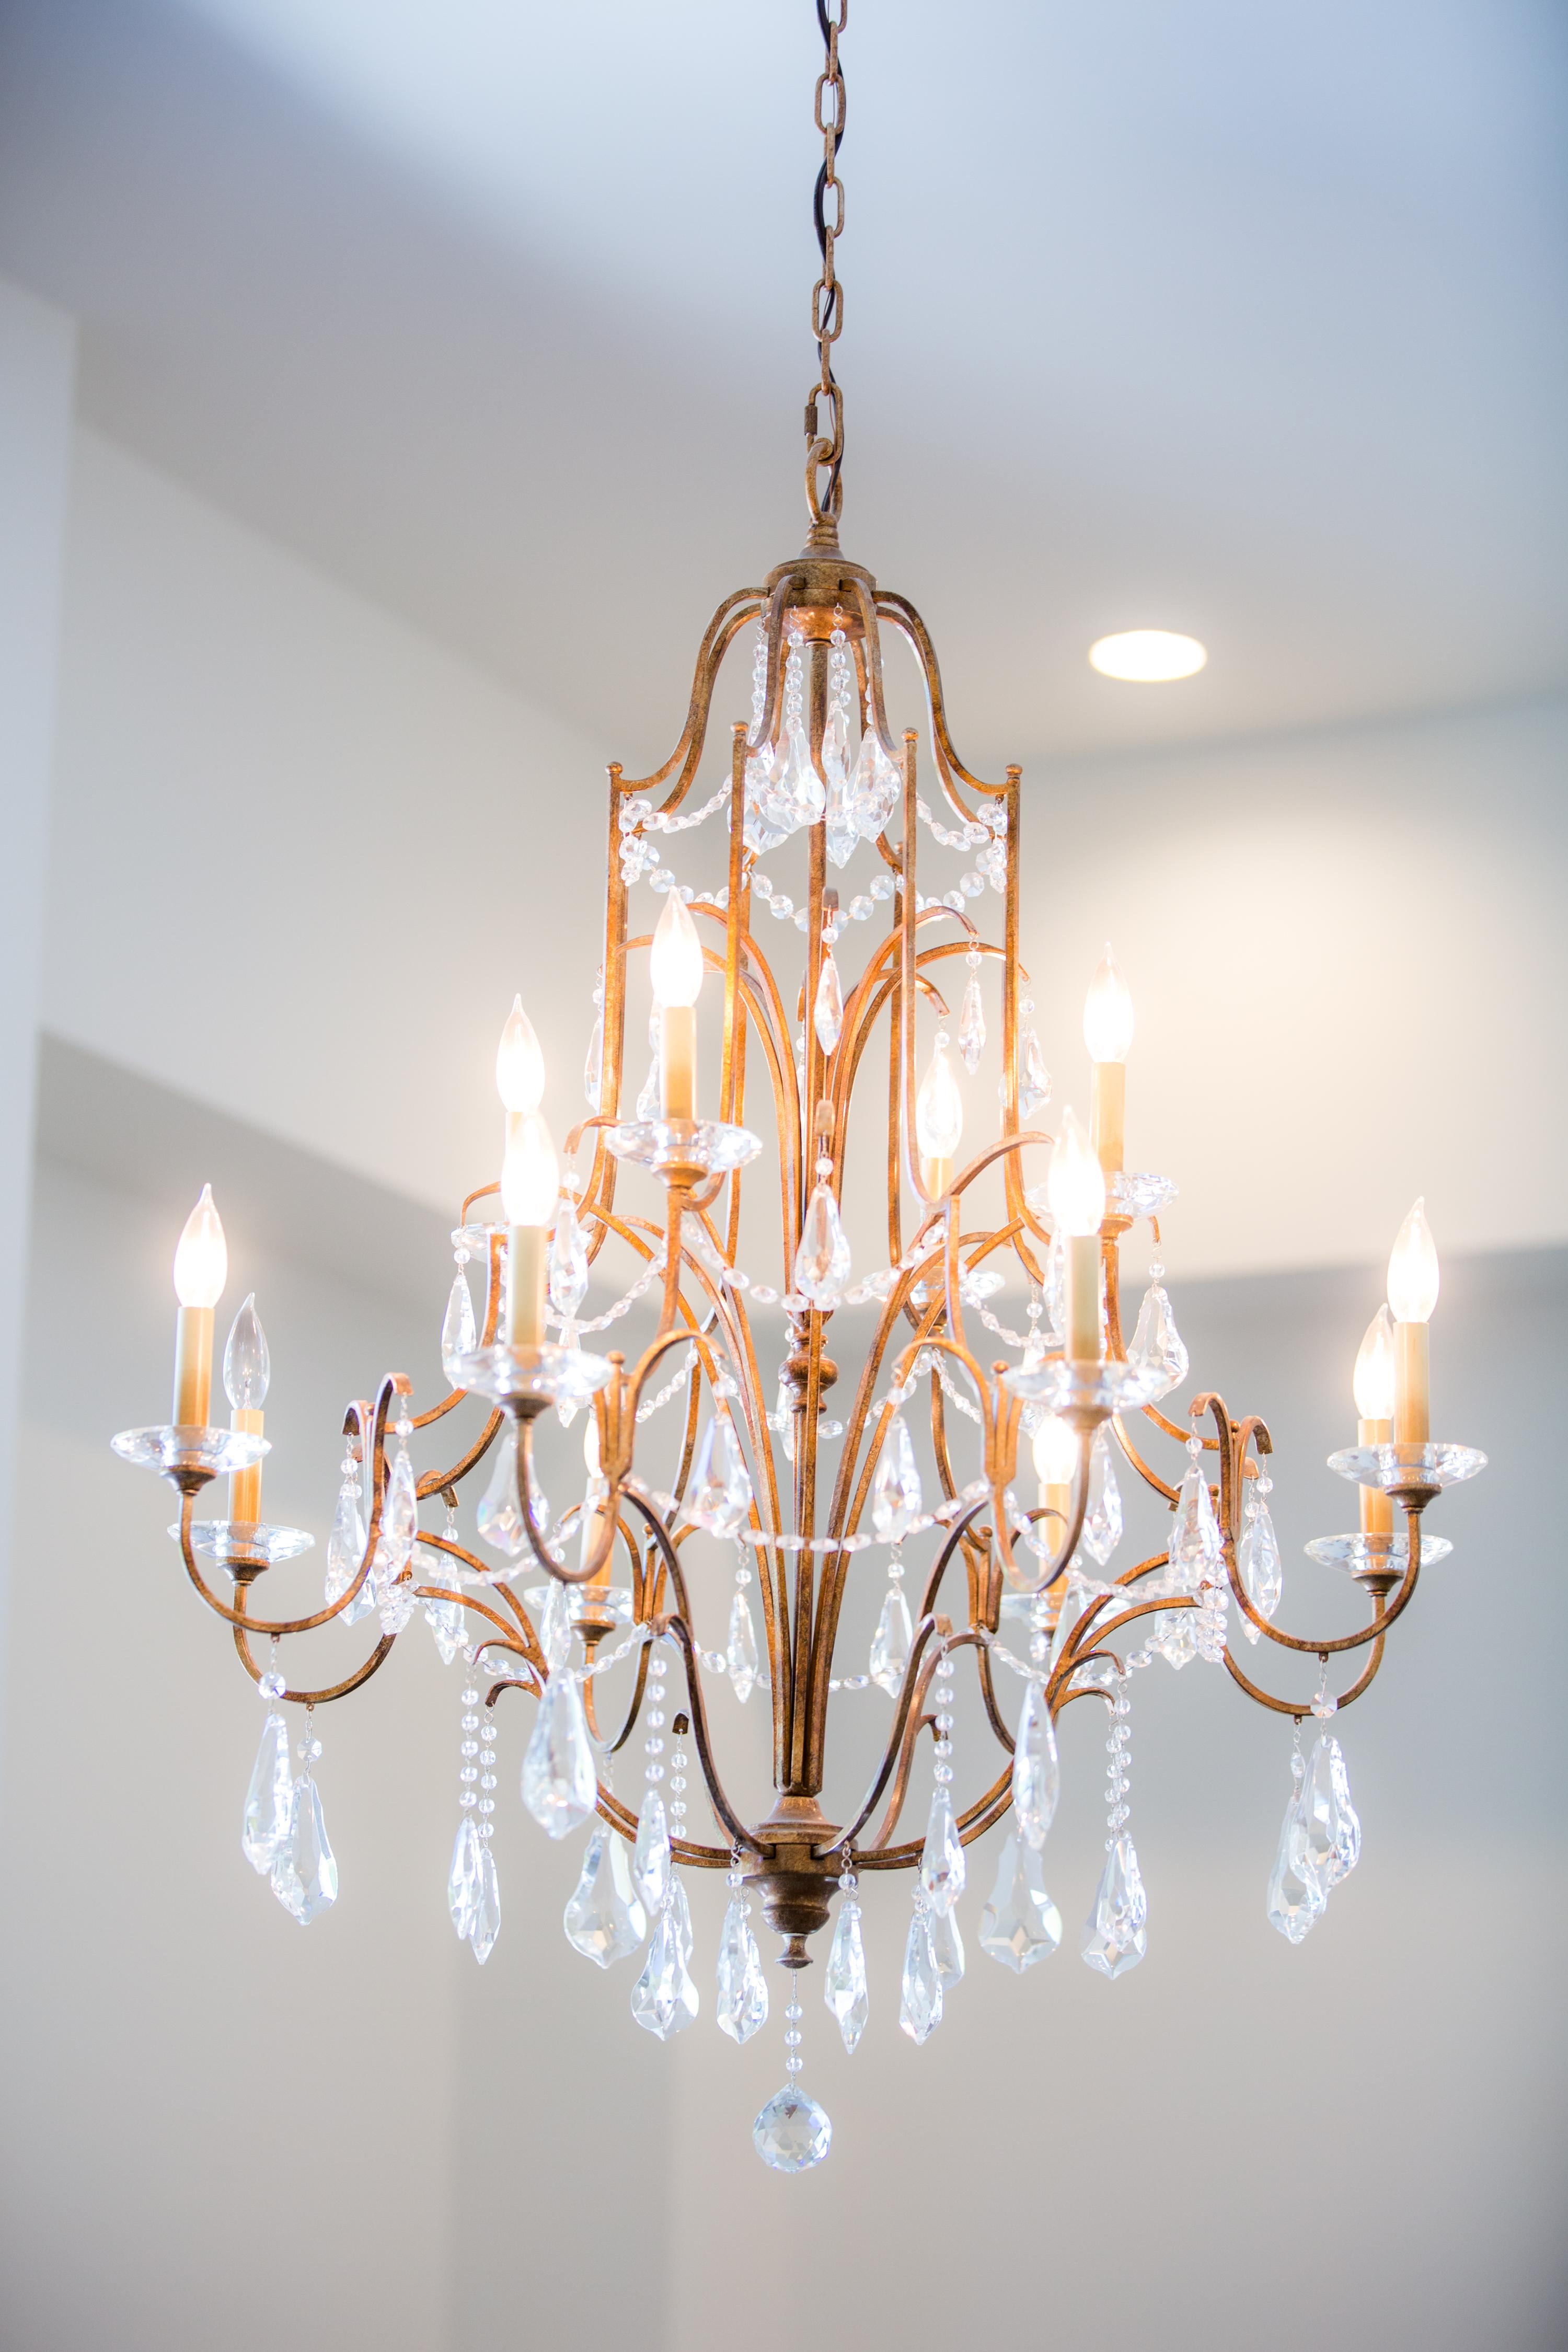 chandelier at wrightsville manor